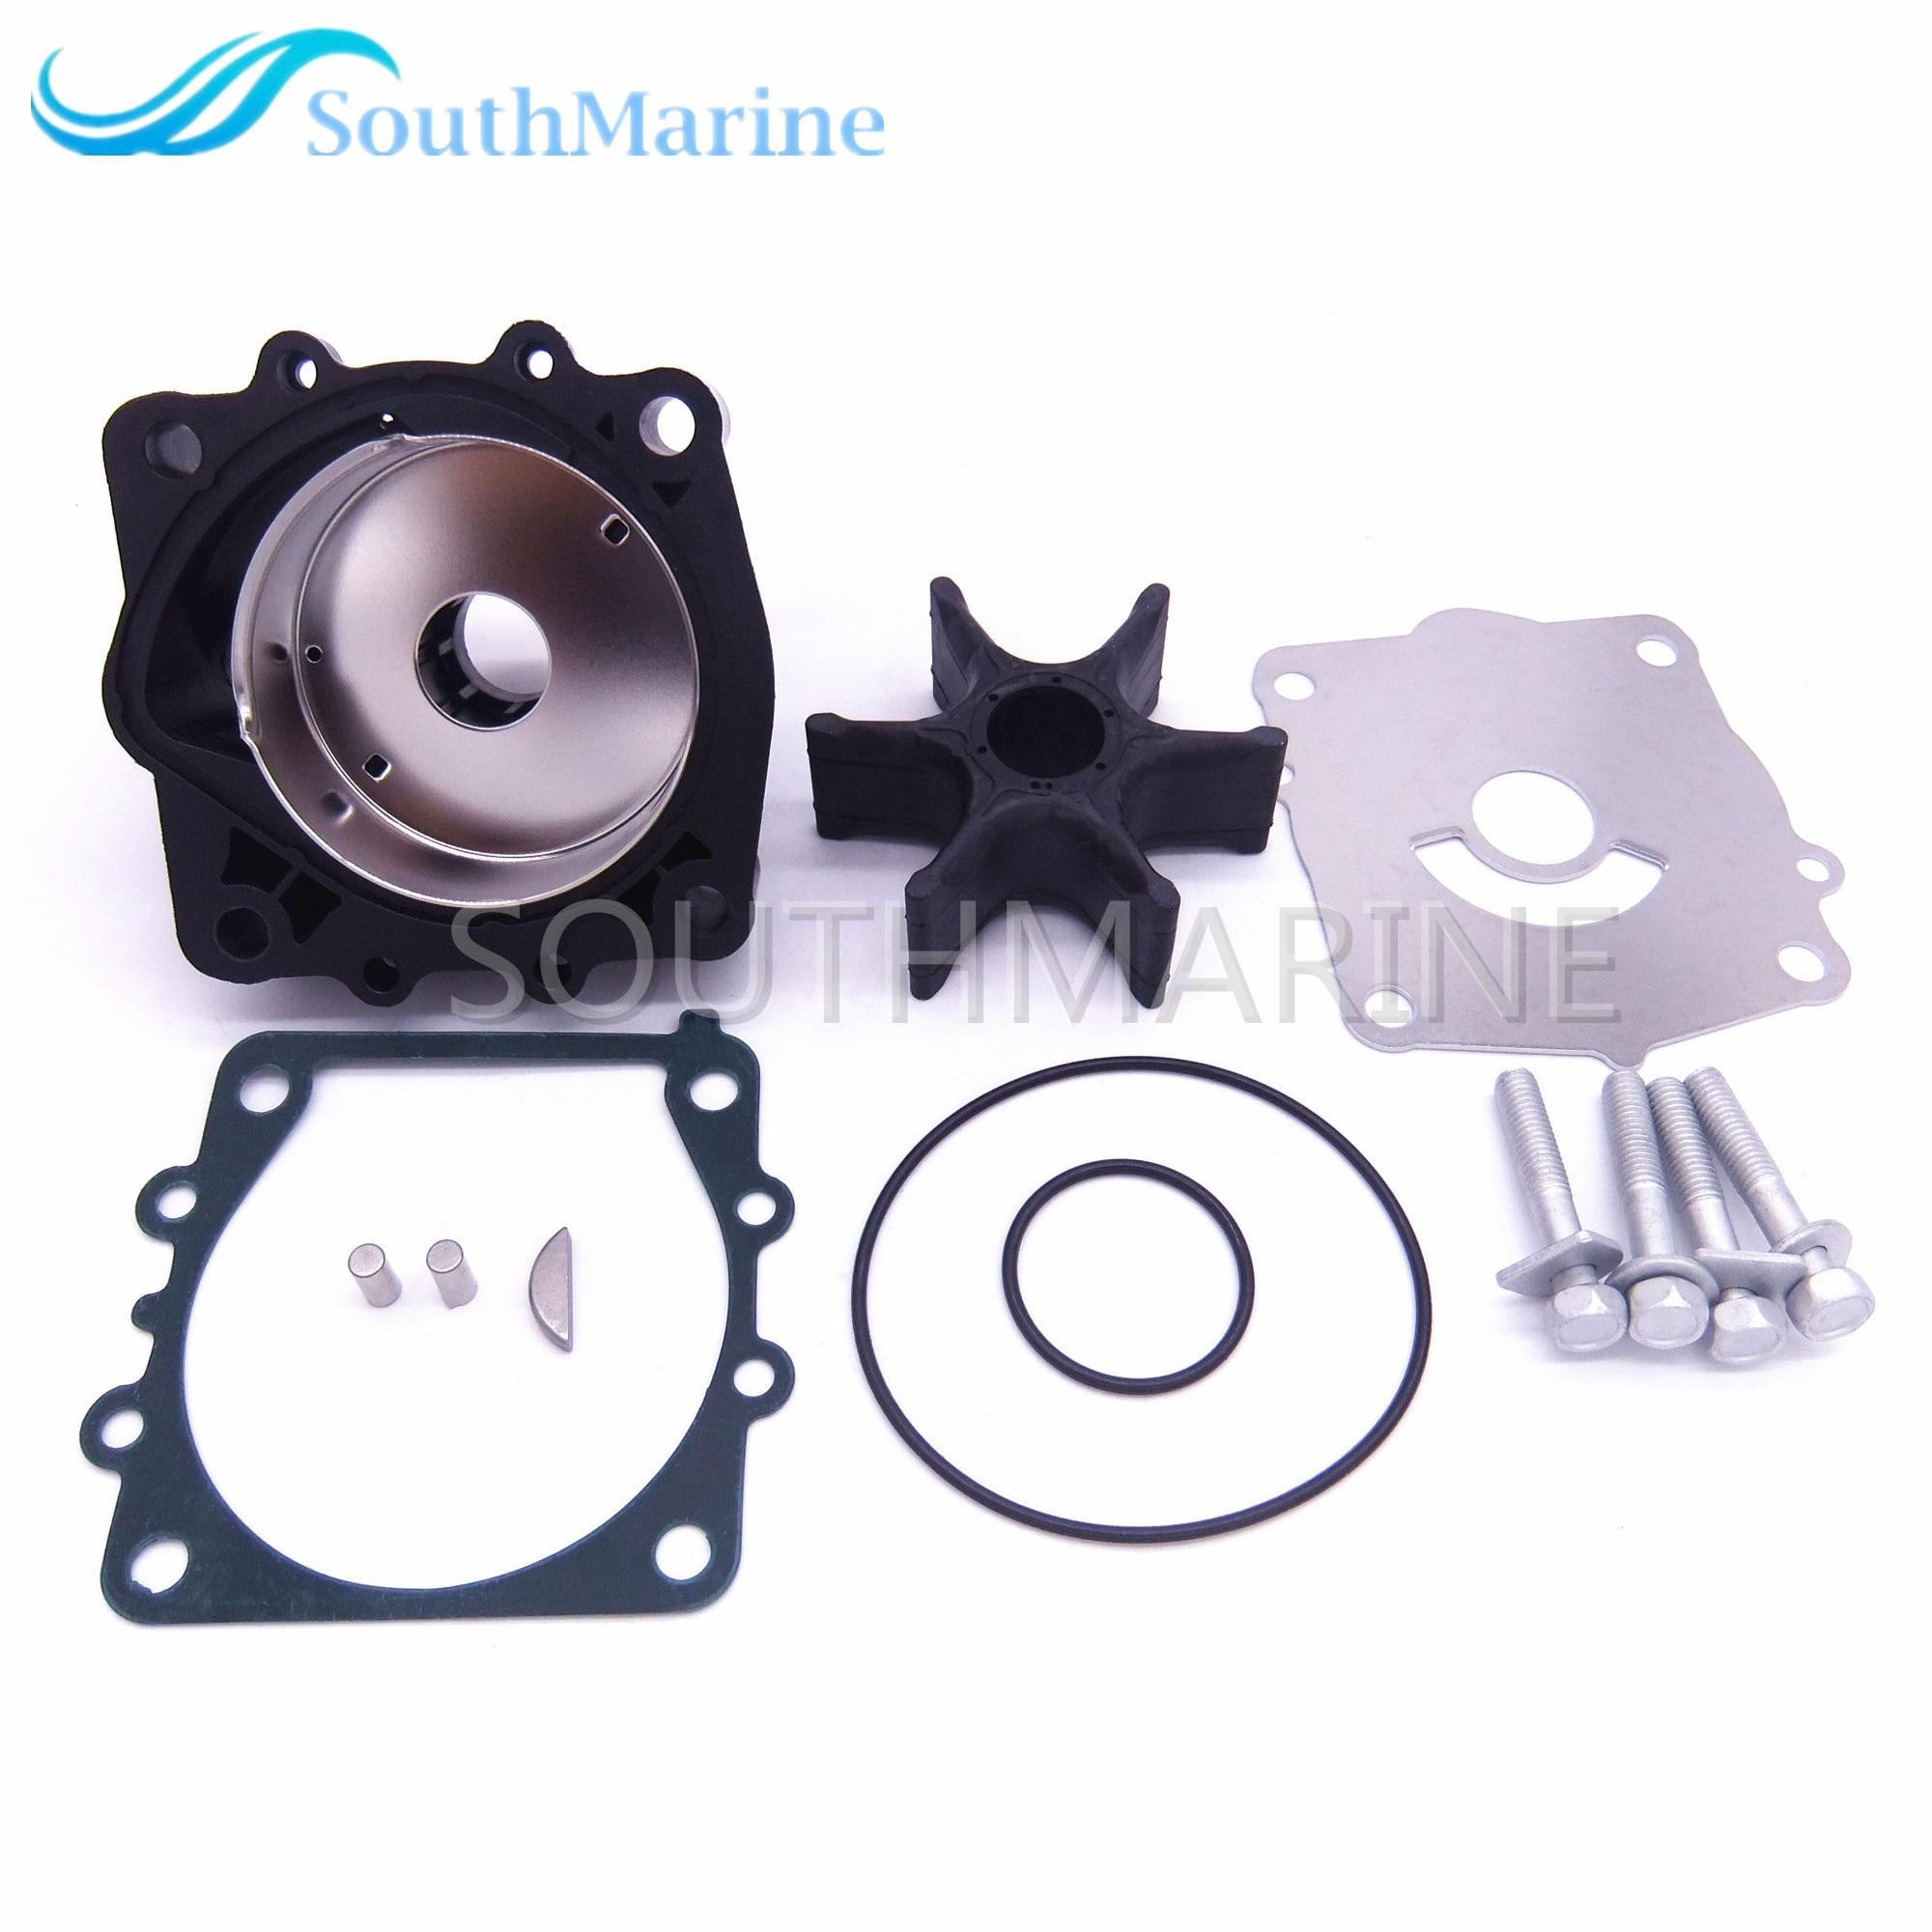 Outboard Motors 68V W0078 68V W0078 00 Water Pump Kit For Yamaha 115HP F115 Boat Free